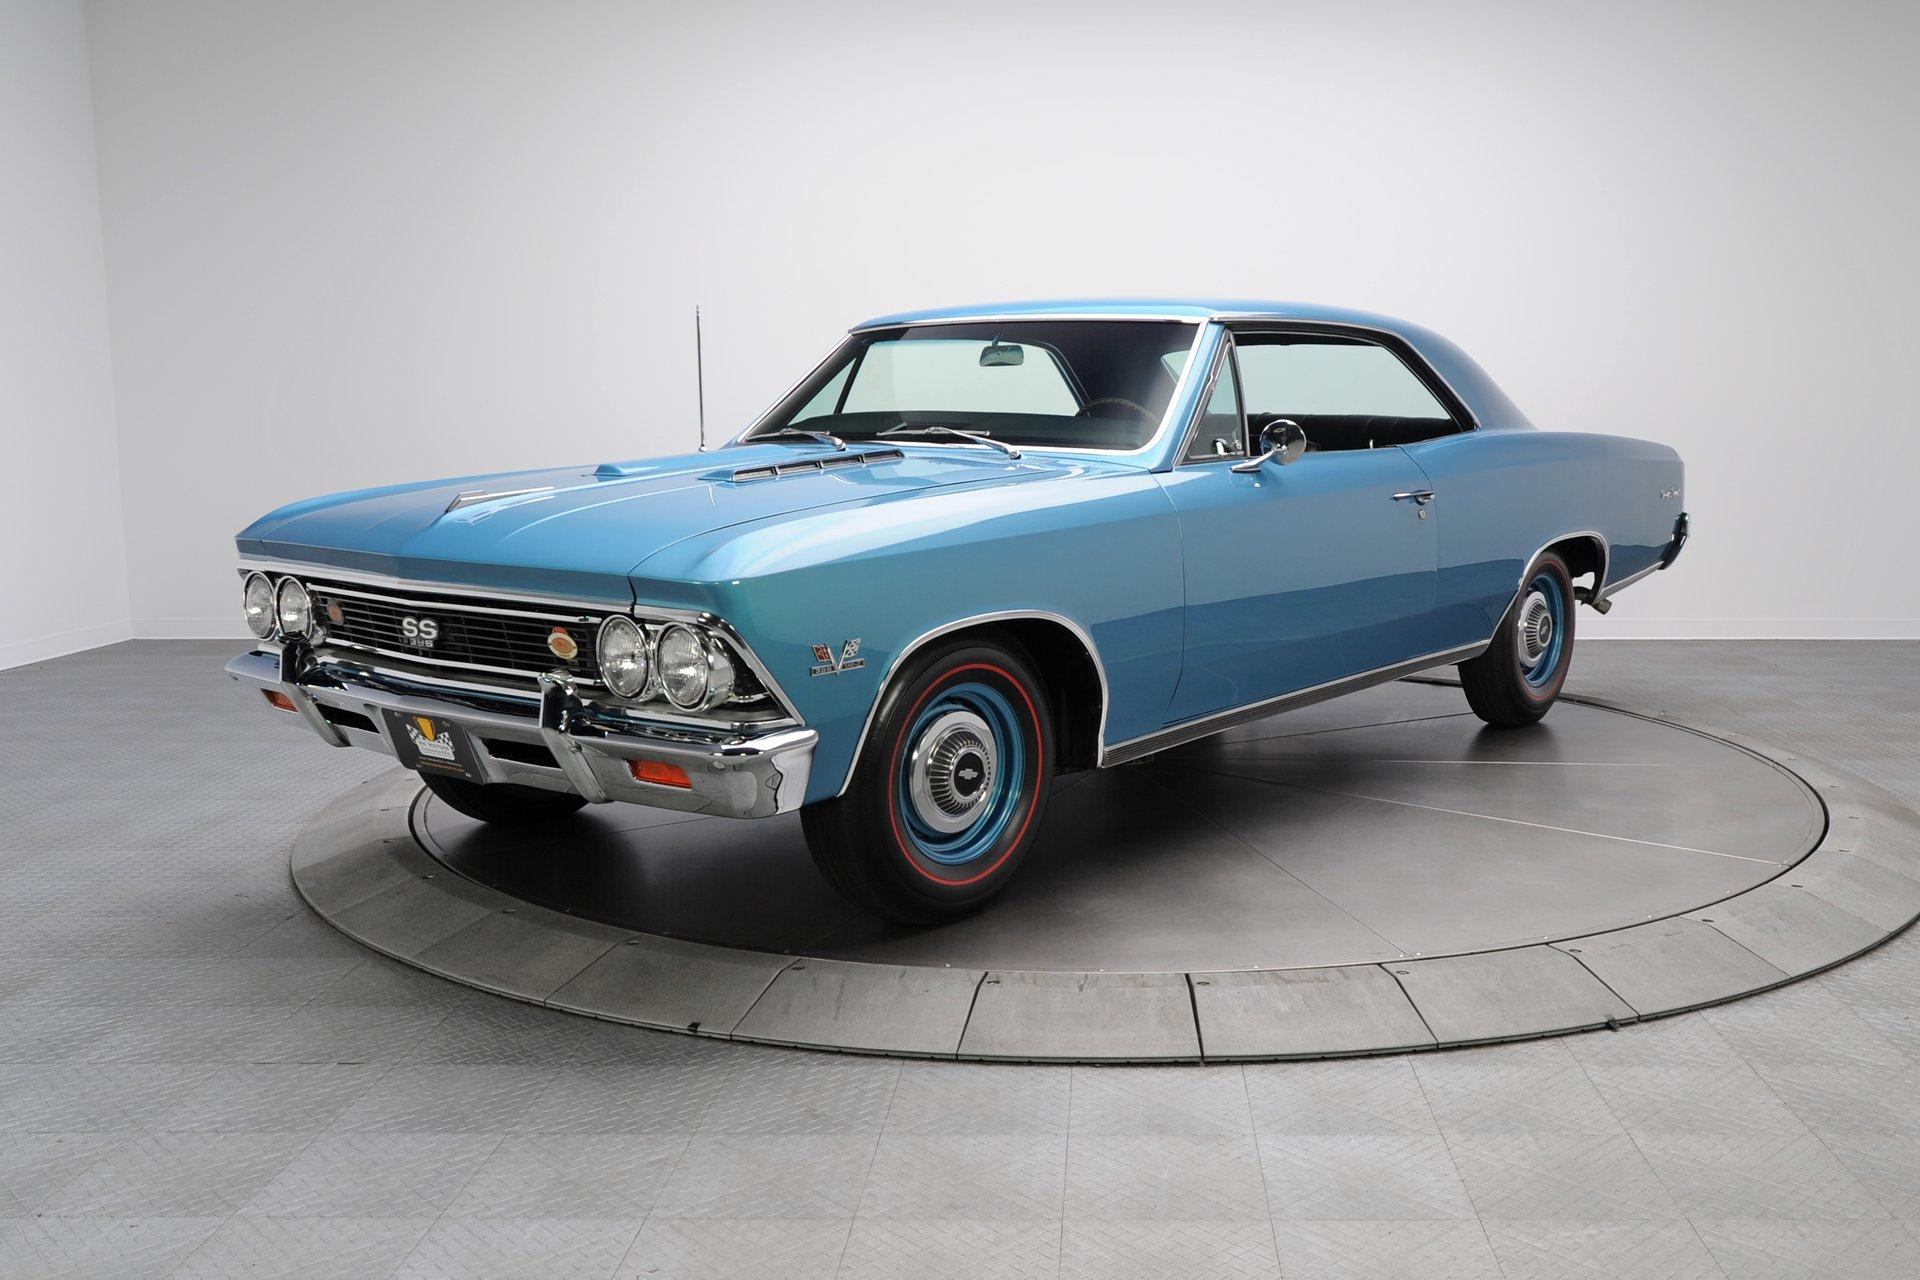 134628 1966 Chevrolet Chevelle RK Motors Classic Cars for Sale